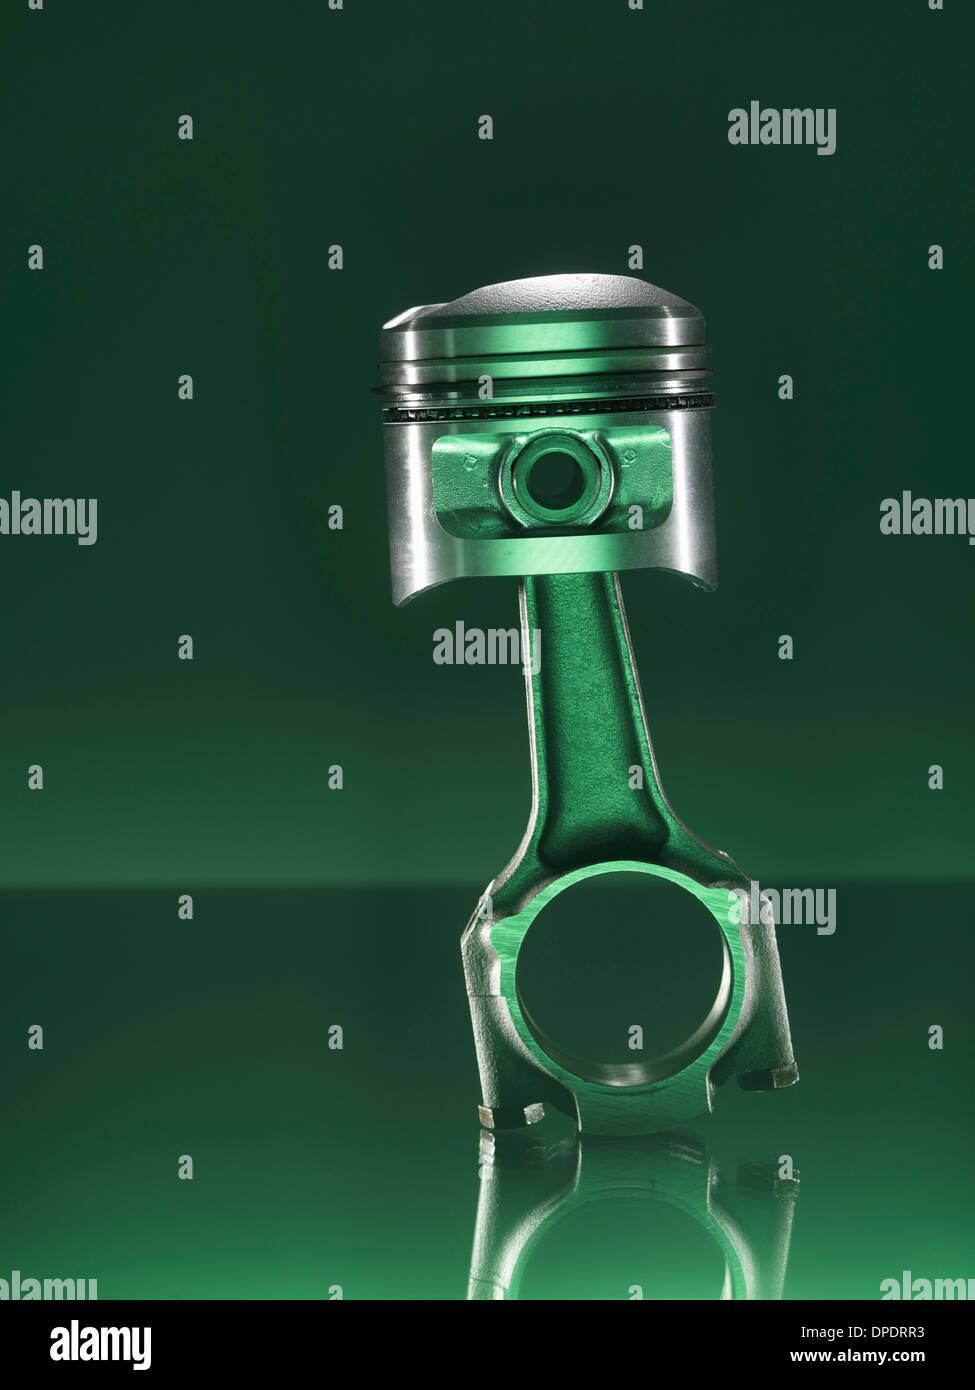 Car piston on green background - Stock Image